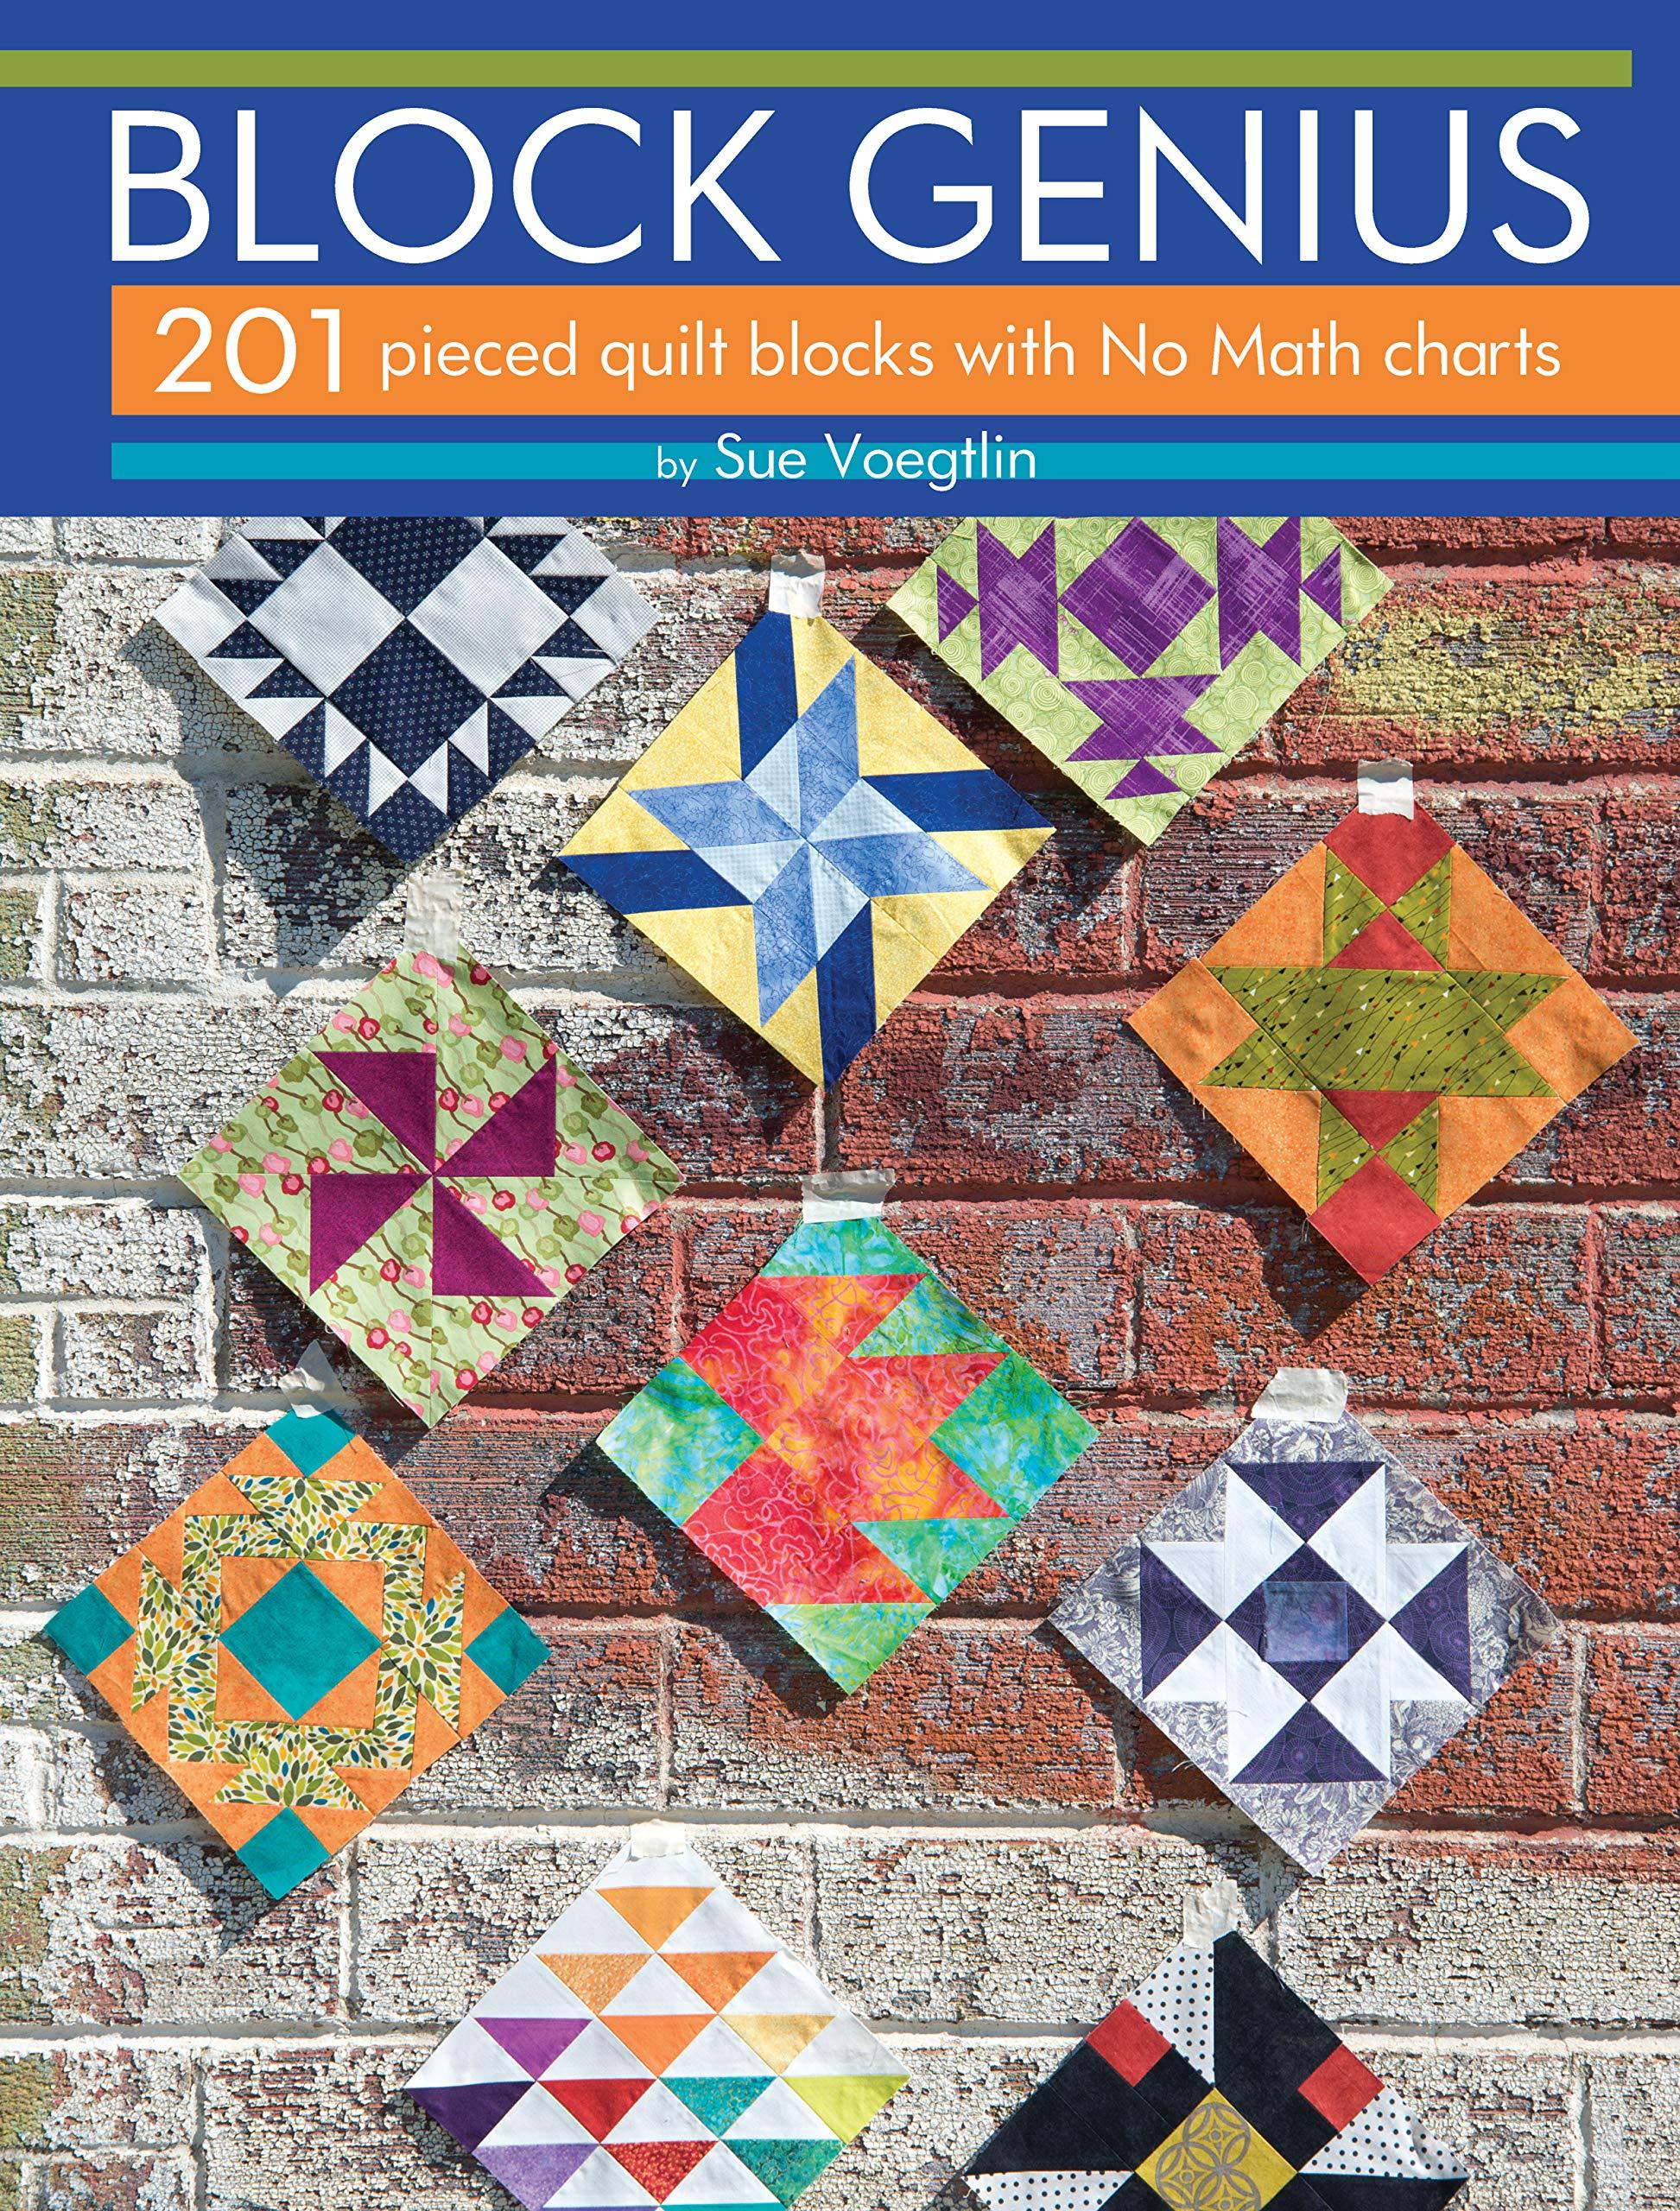 12 Inch Quilt Block Patterns Free Patterns